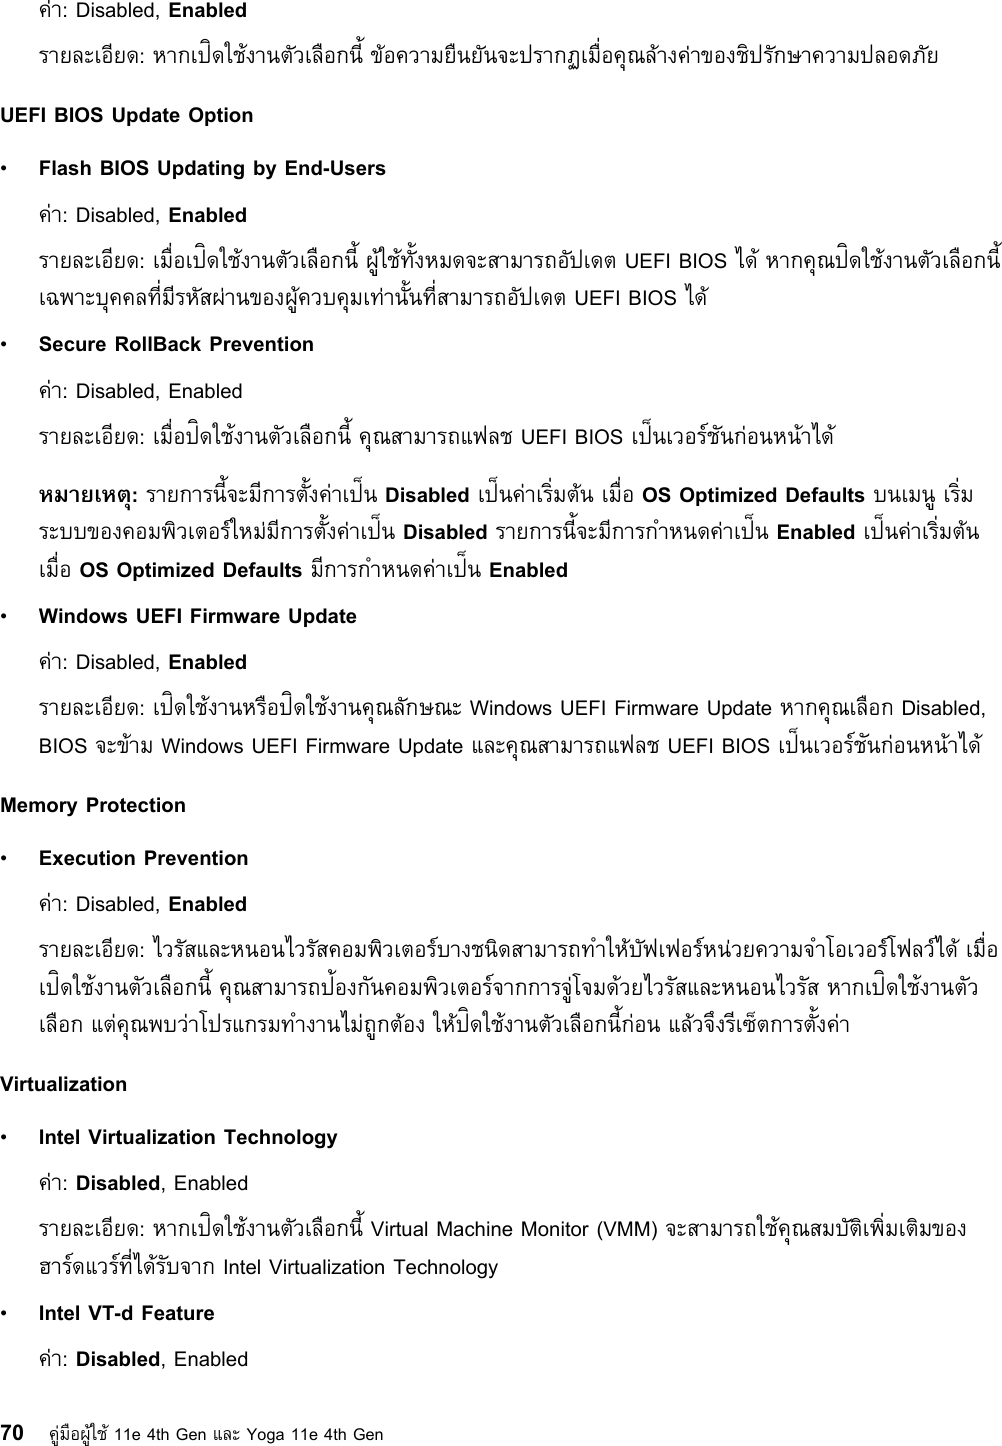 Lenovo 11E 4Th Gen And Yoga Ug Th User Manual (Thai) Guide Think Pad